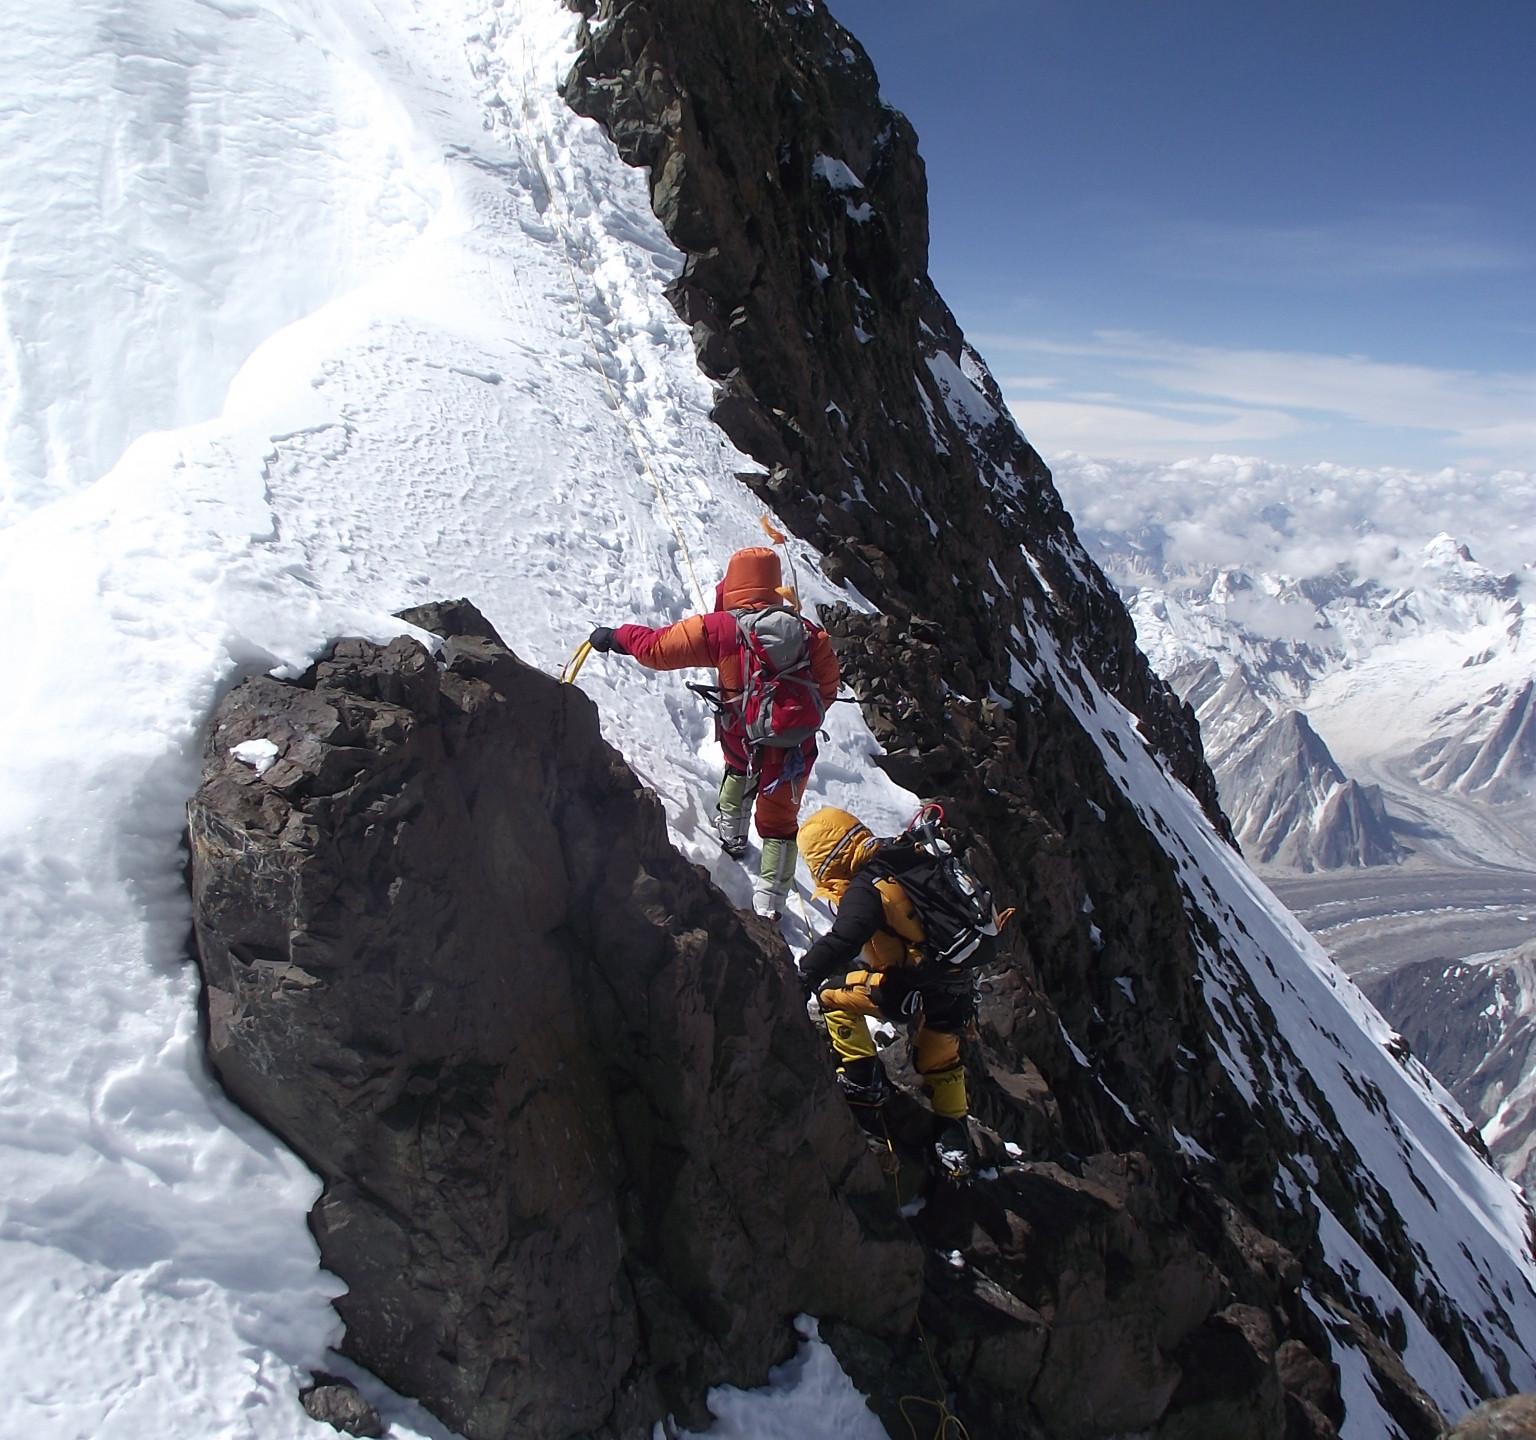 The long edge towards the summit.